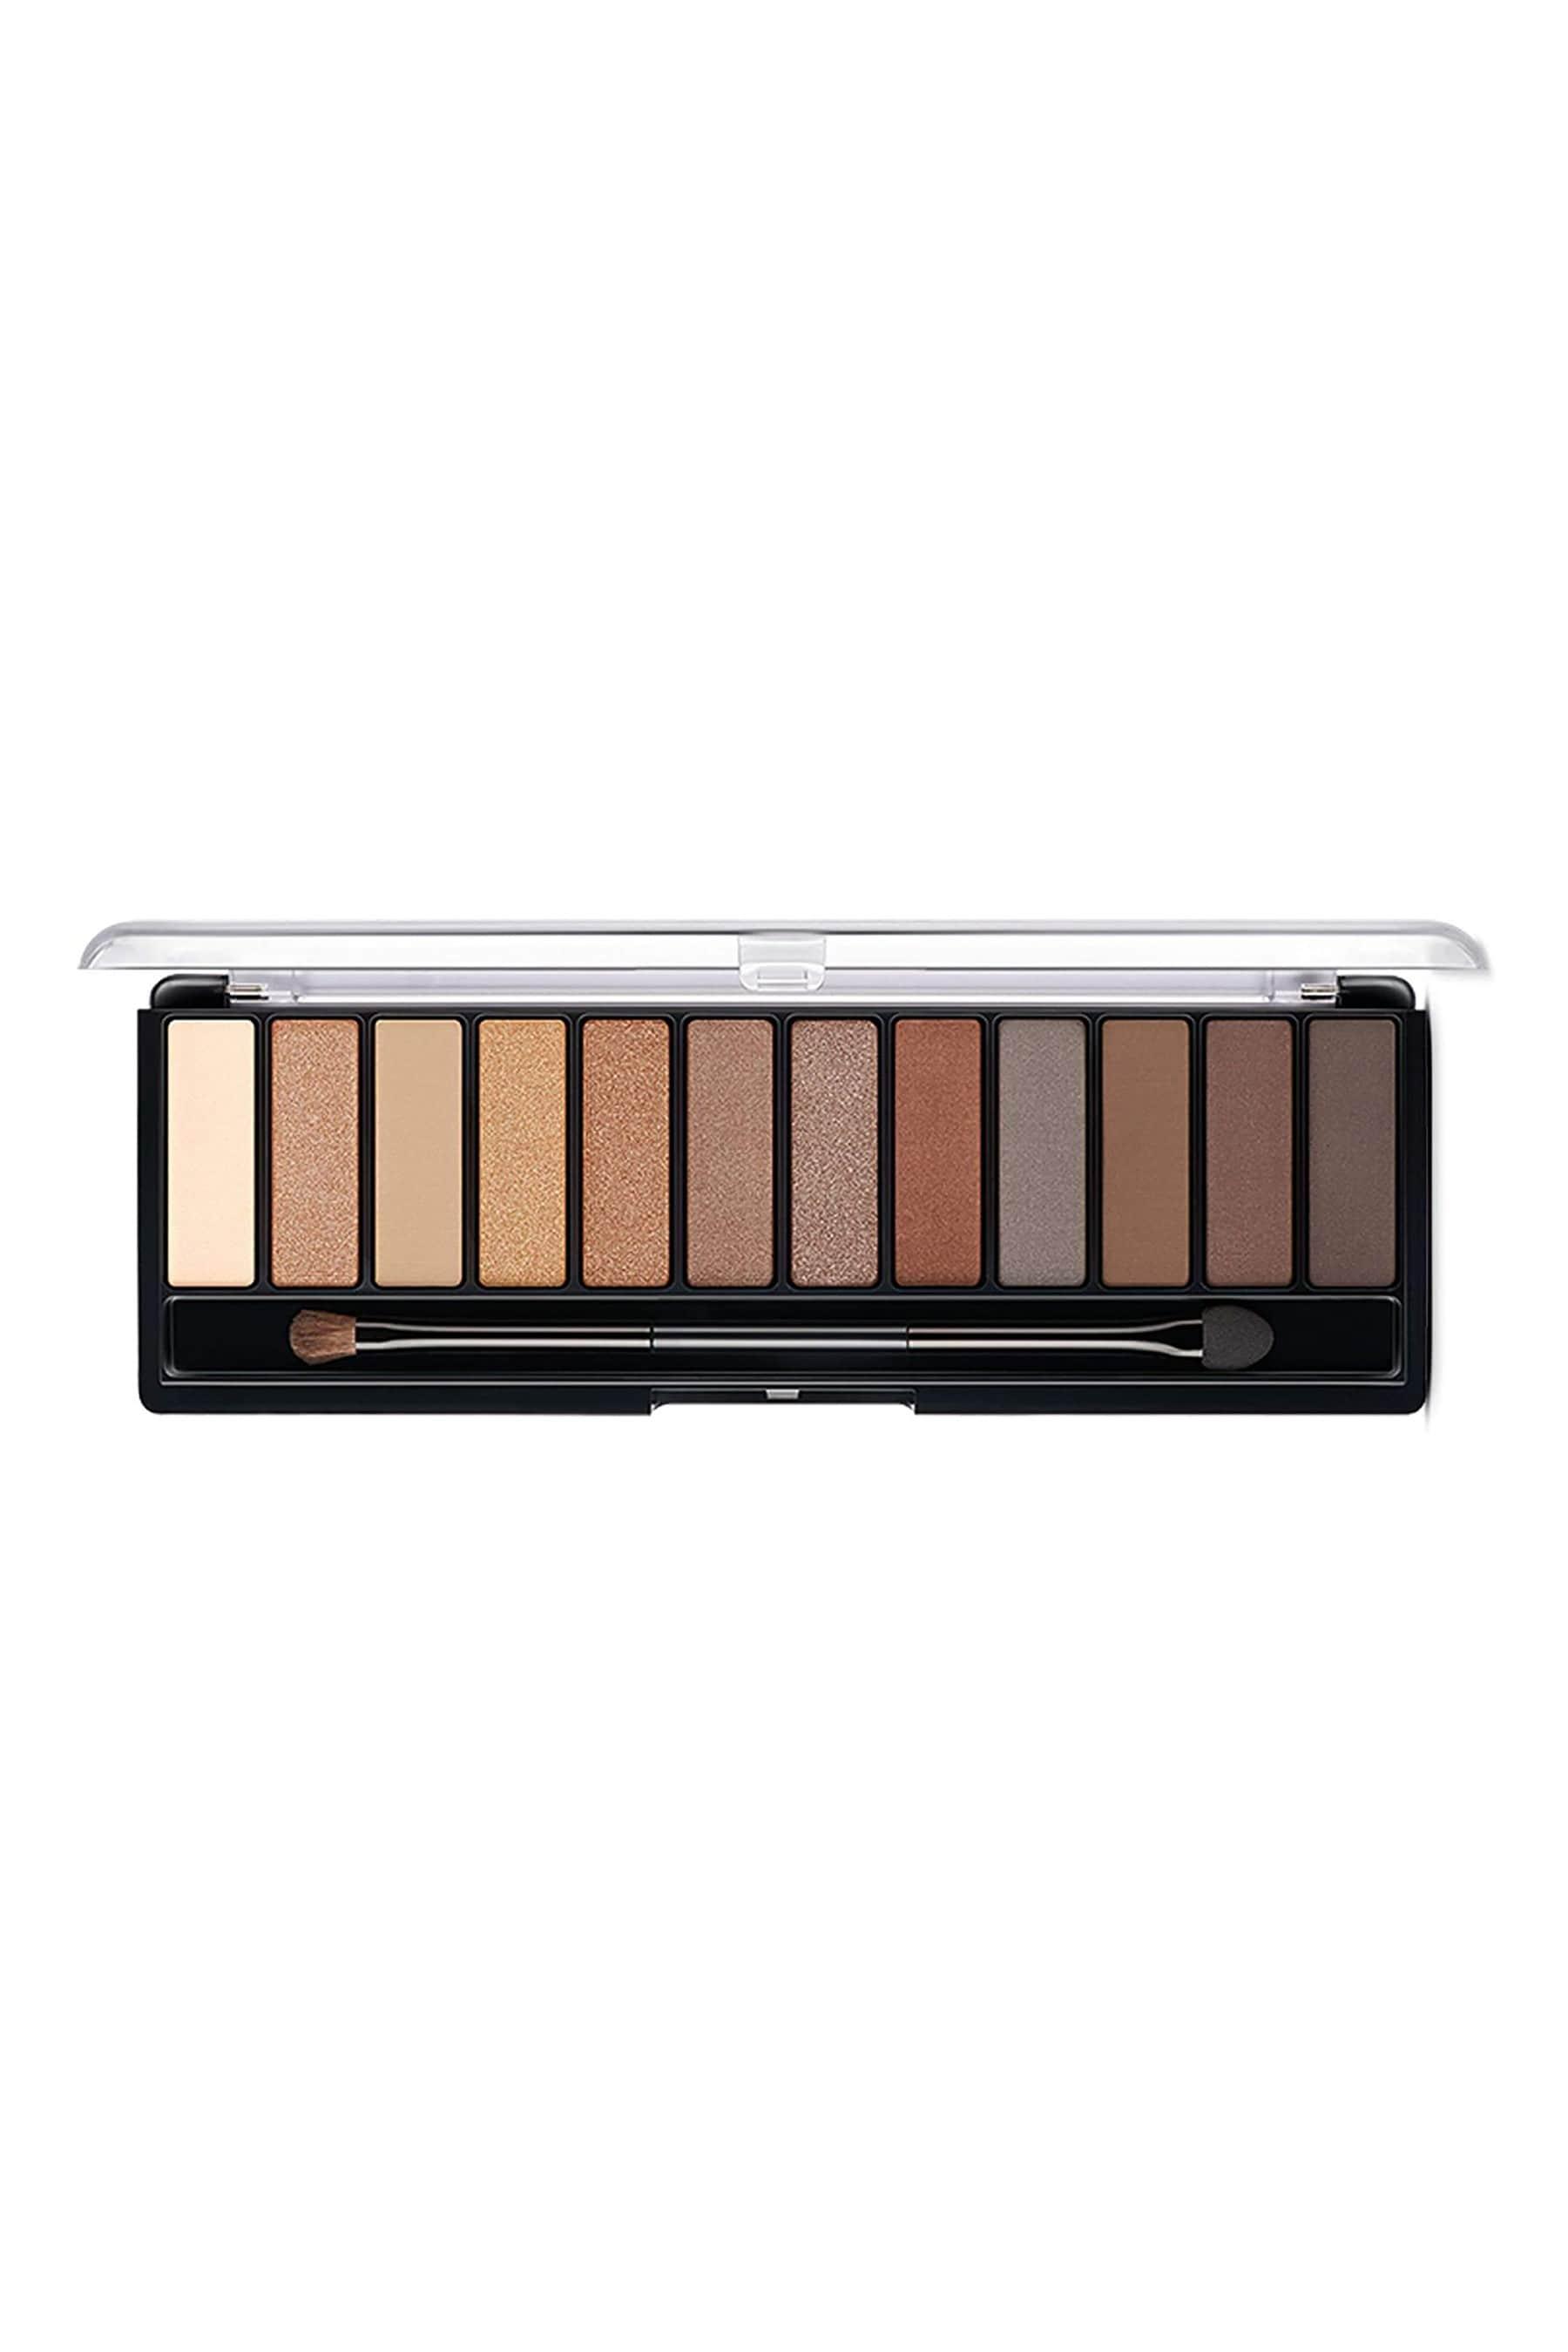 Illamasqua Liquid Metal Eye Shadow Palette | Best